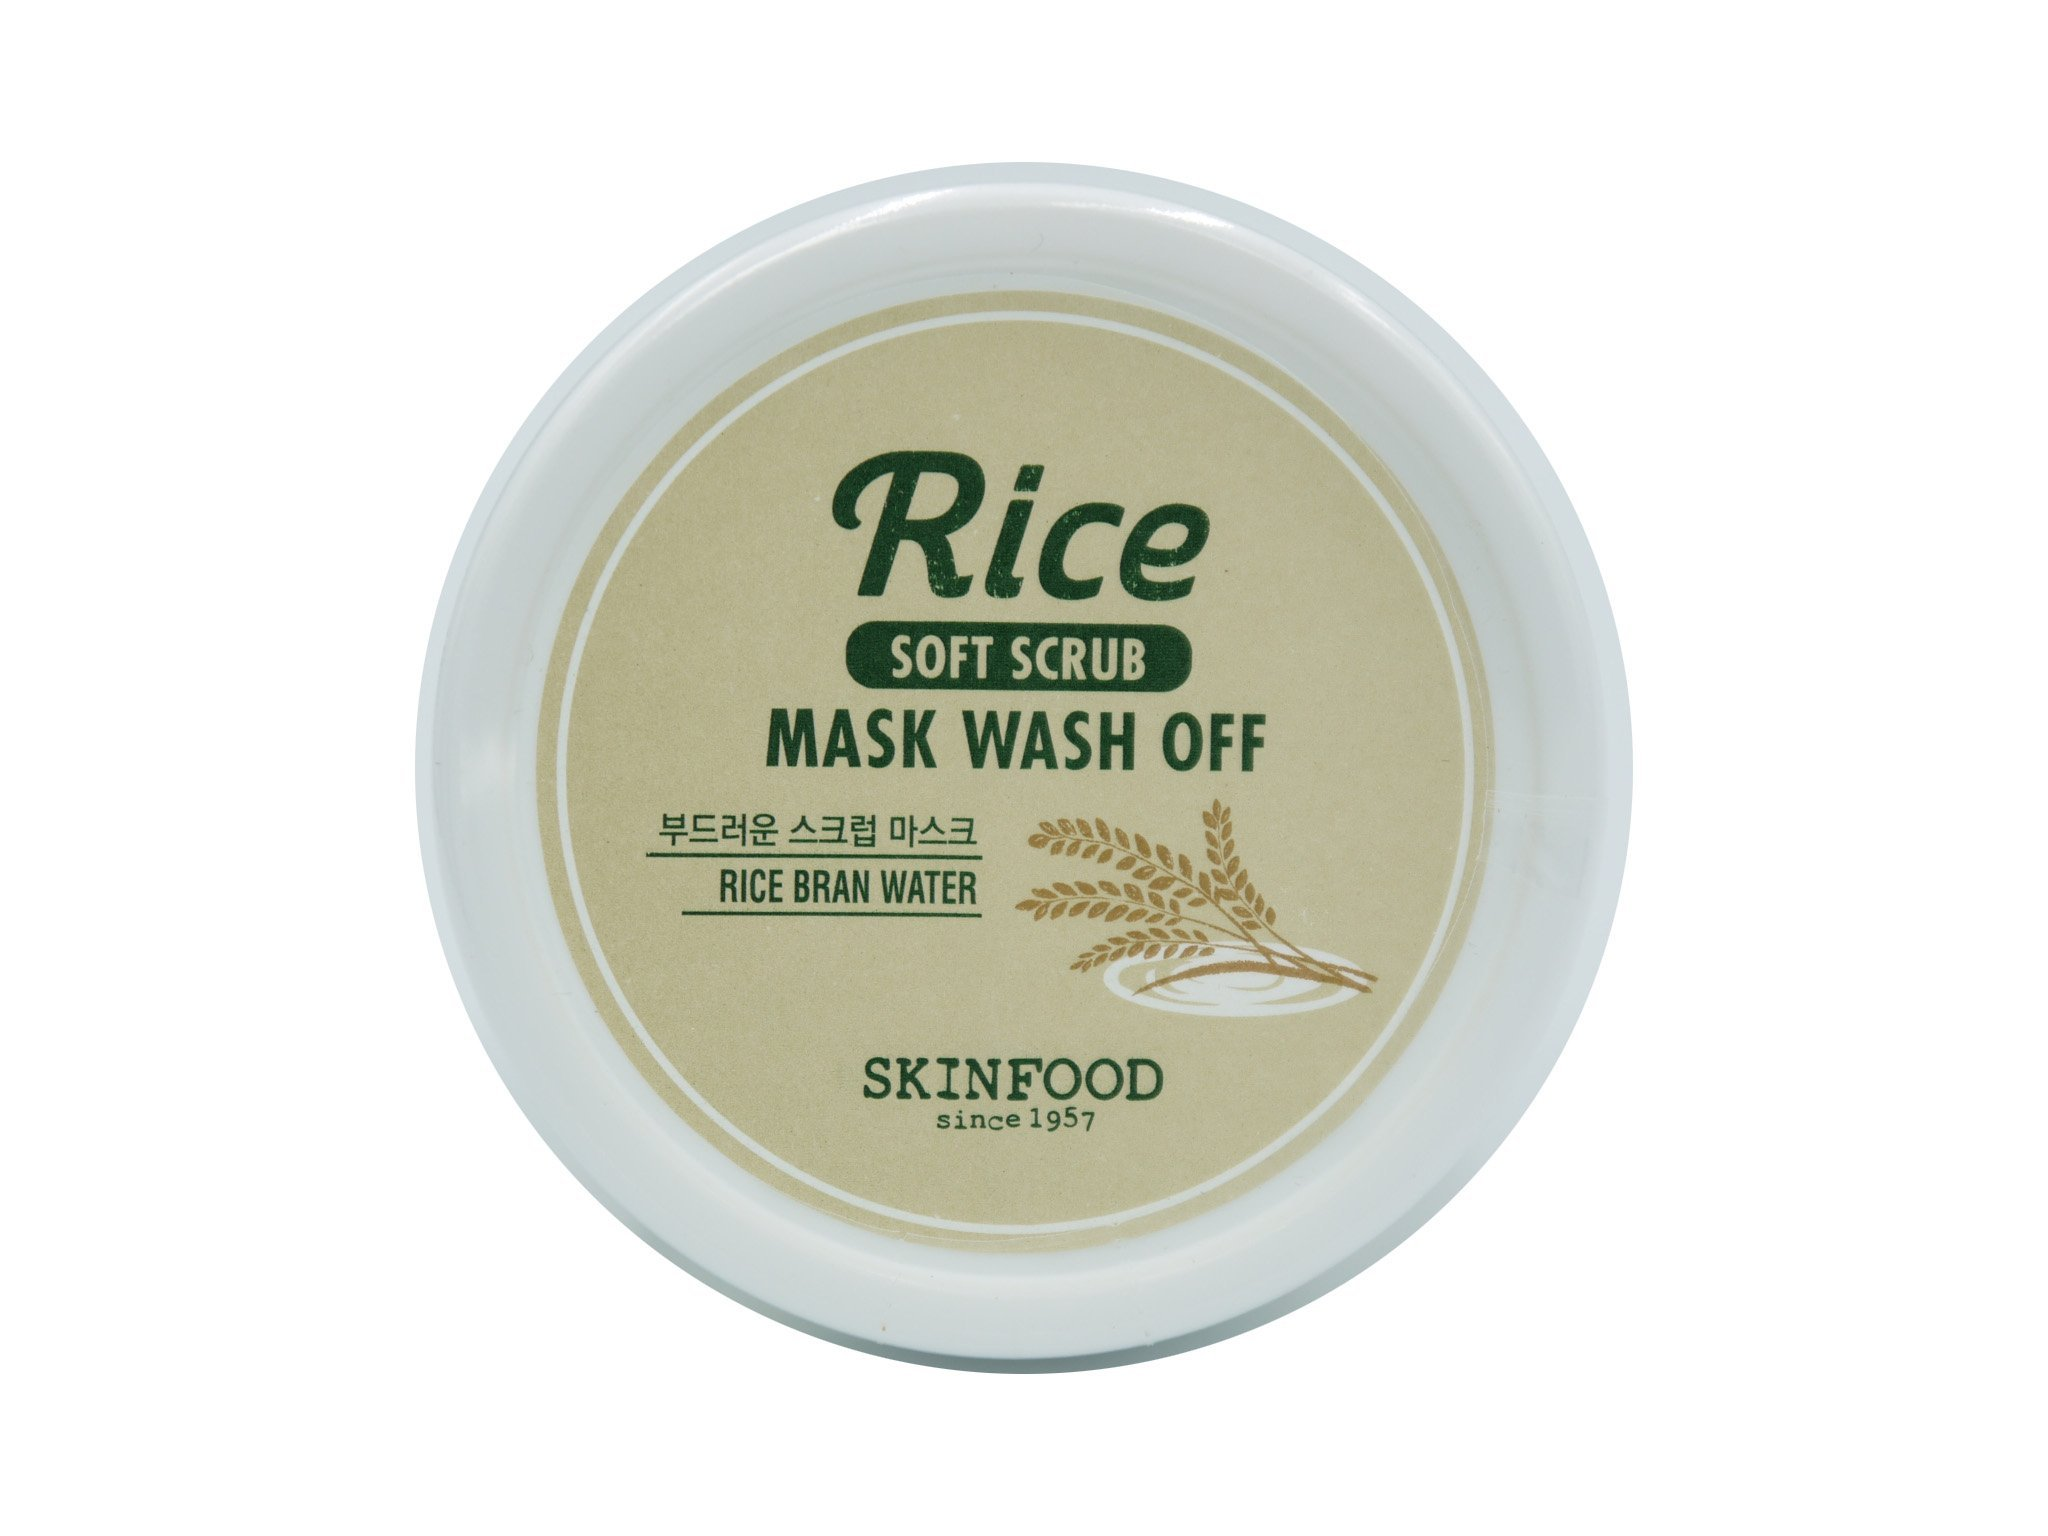 Skinfood Facial Mask Rice Wash Off - 3.52 Oz